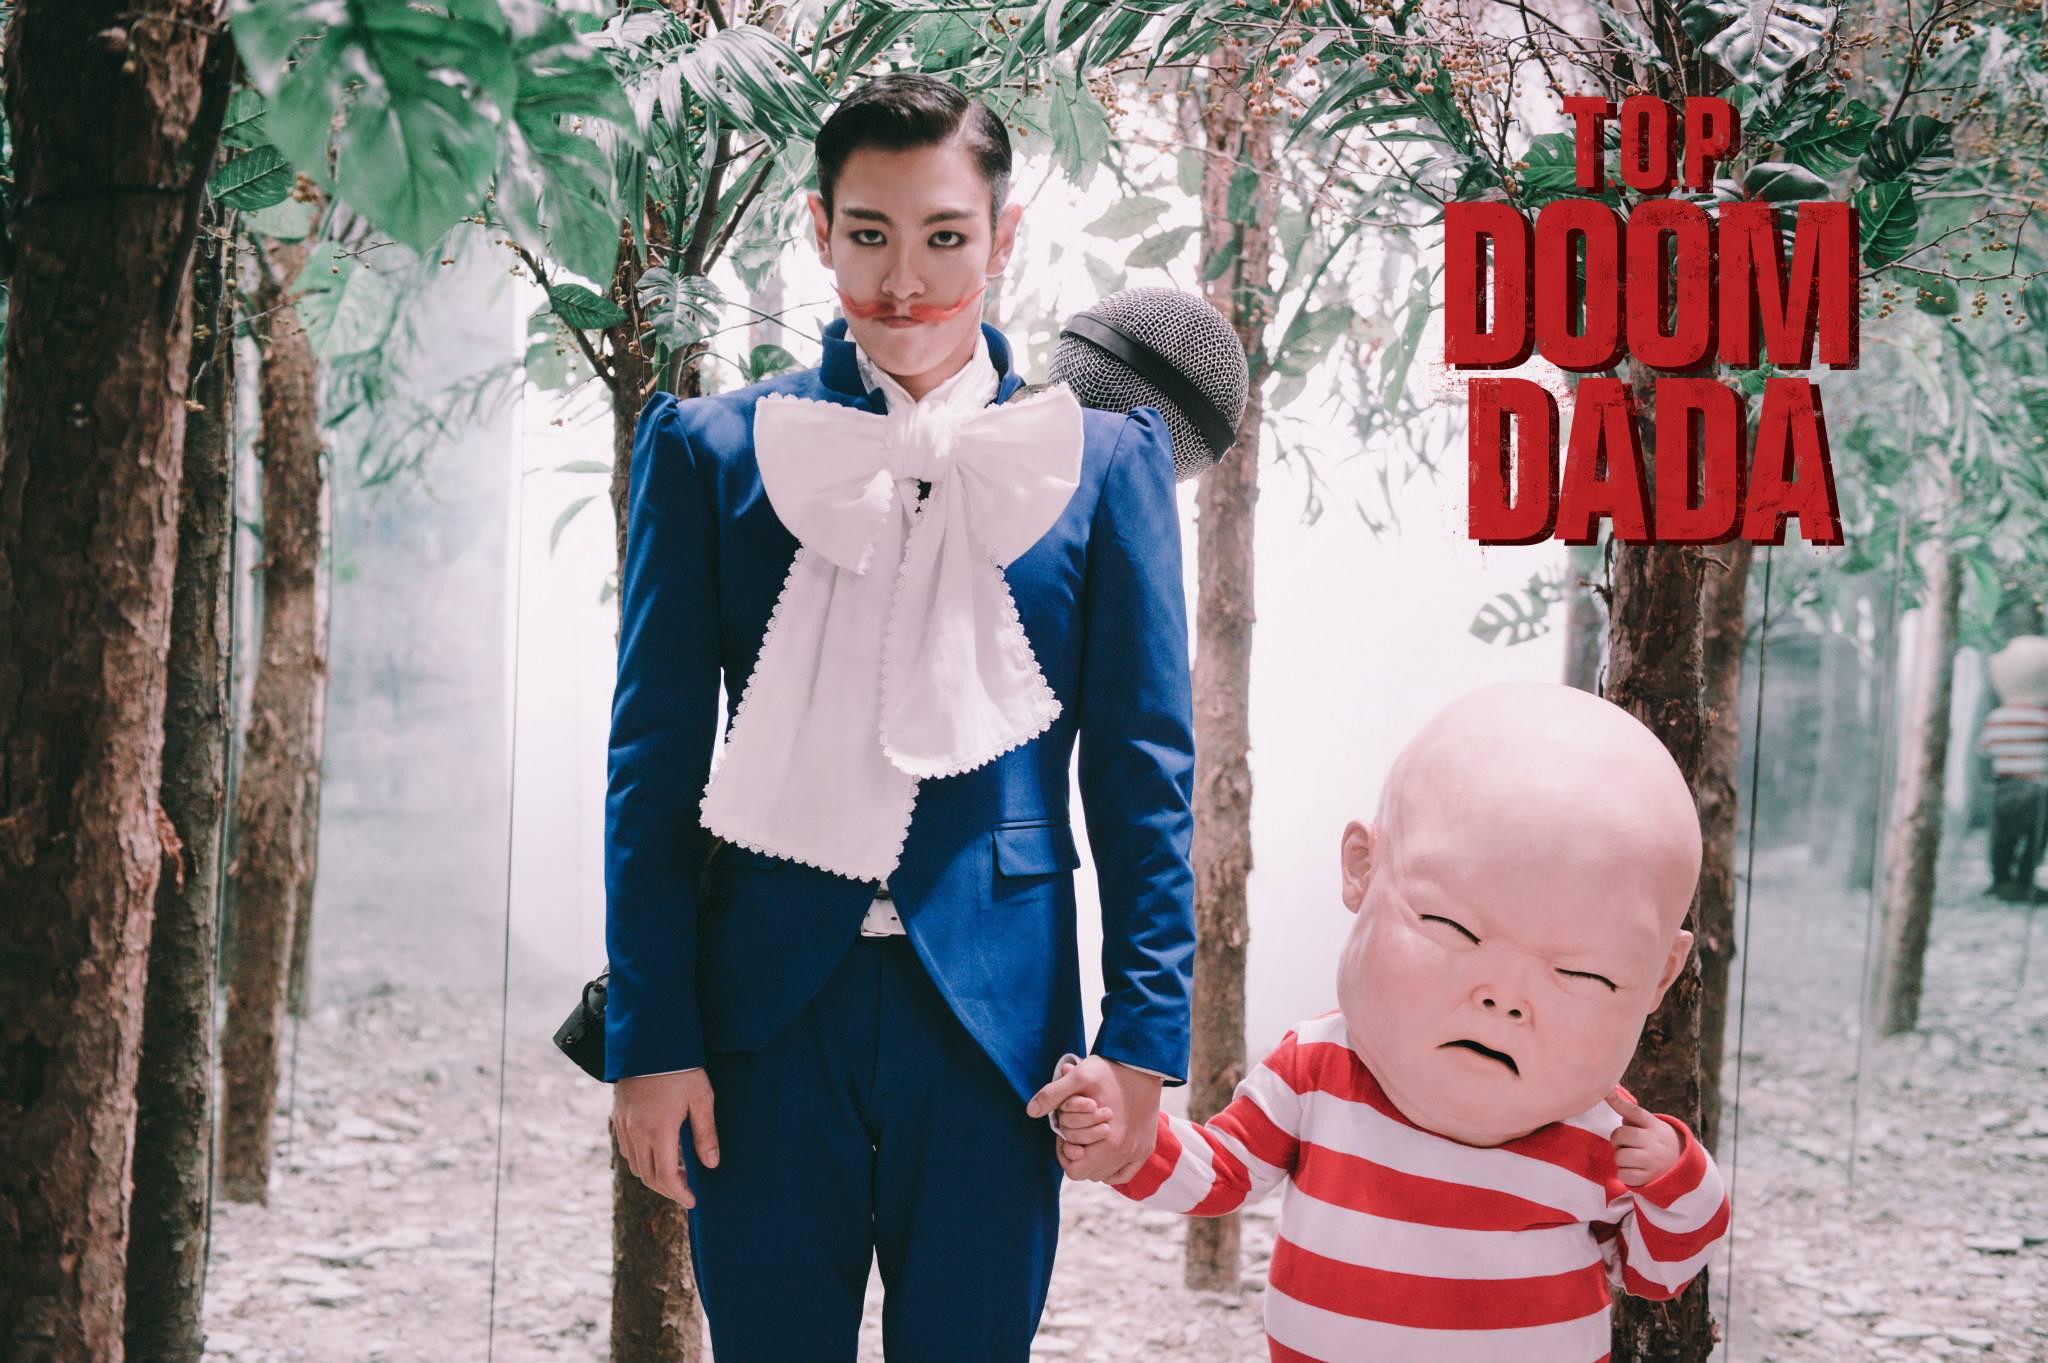 3. DOOM DADA (2013.11.15)  SOLO曲的用意,就是讓大家看見你個人的獨特色彩!而這首《DOOM DADA》的發行,如果你摸不著頭緒的話,那你就看見真的TOP了XDD